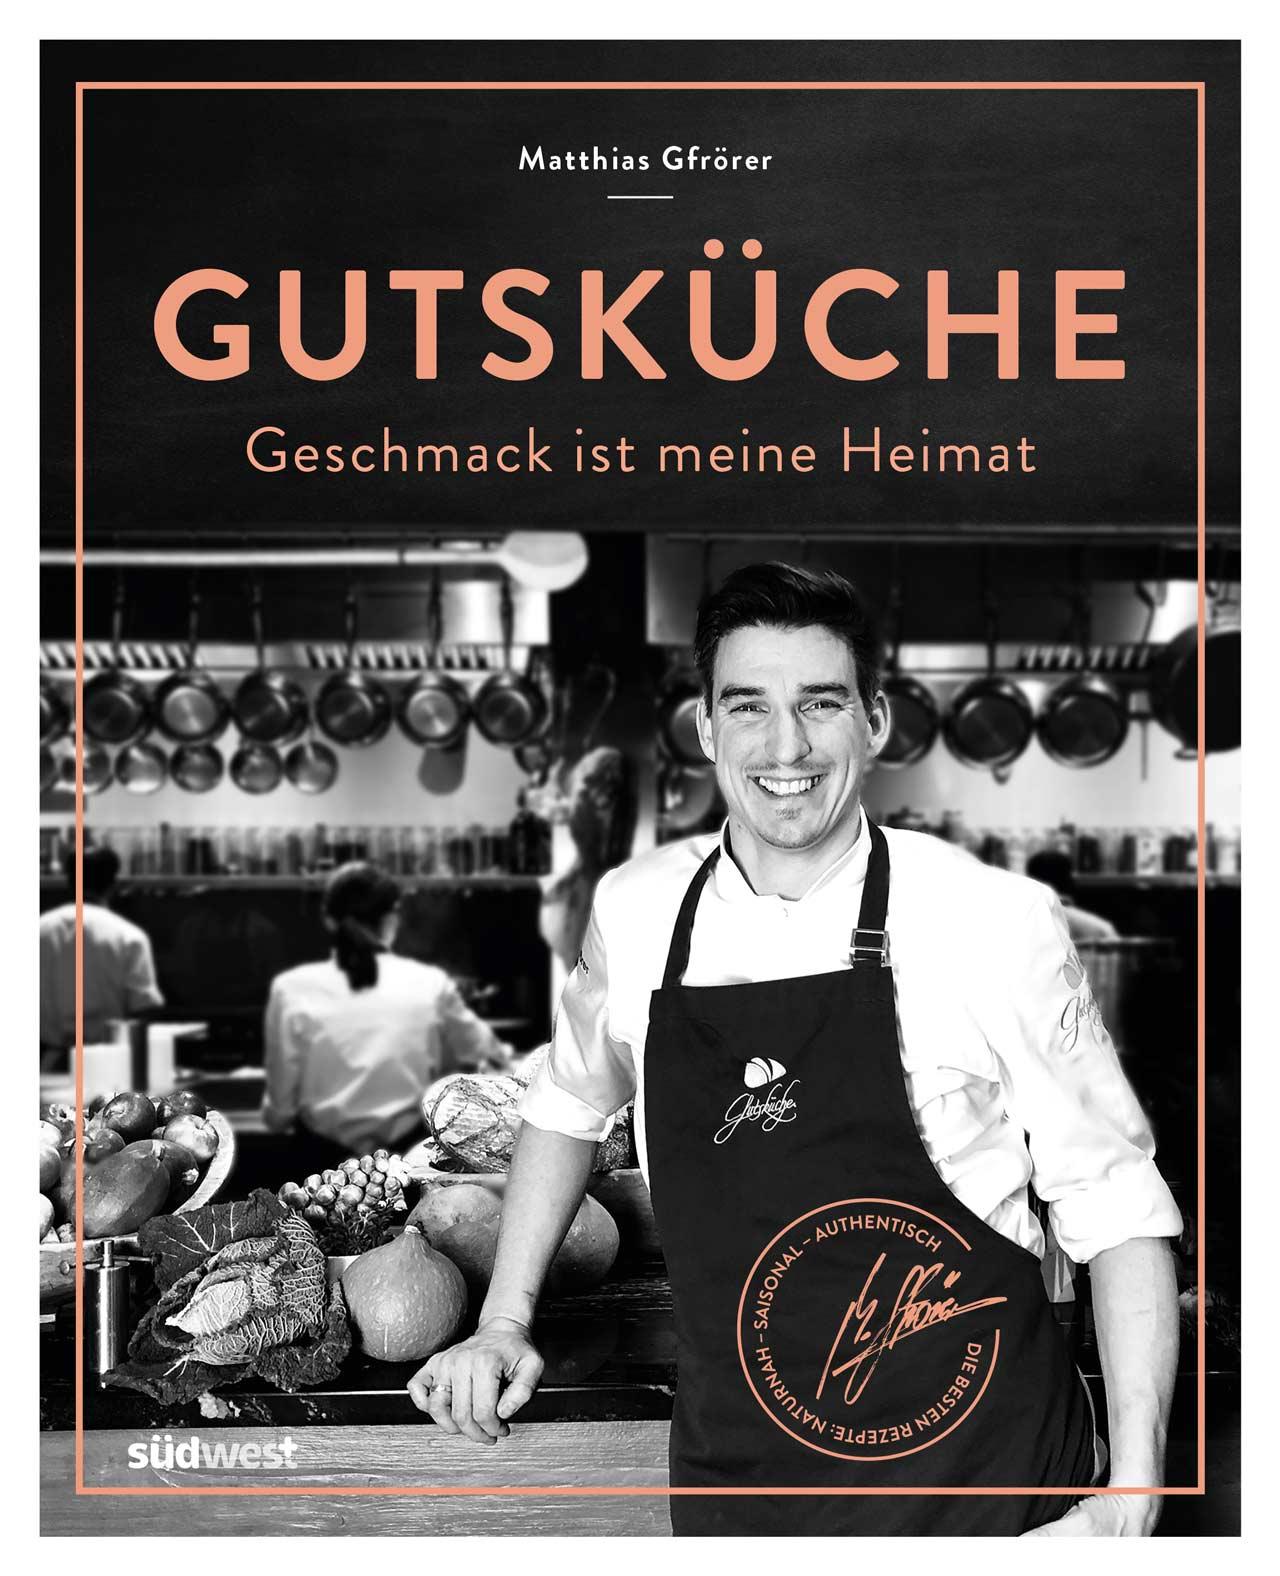 Matthias Gfrörer - Gutsküche: Geschmack ist meine Heimat